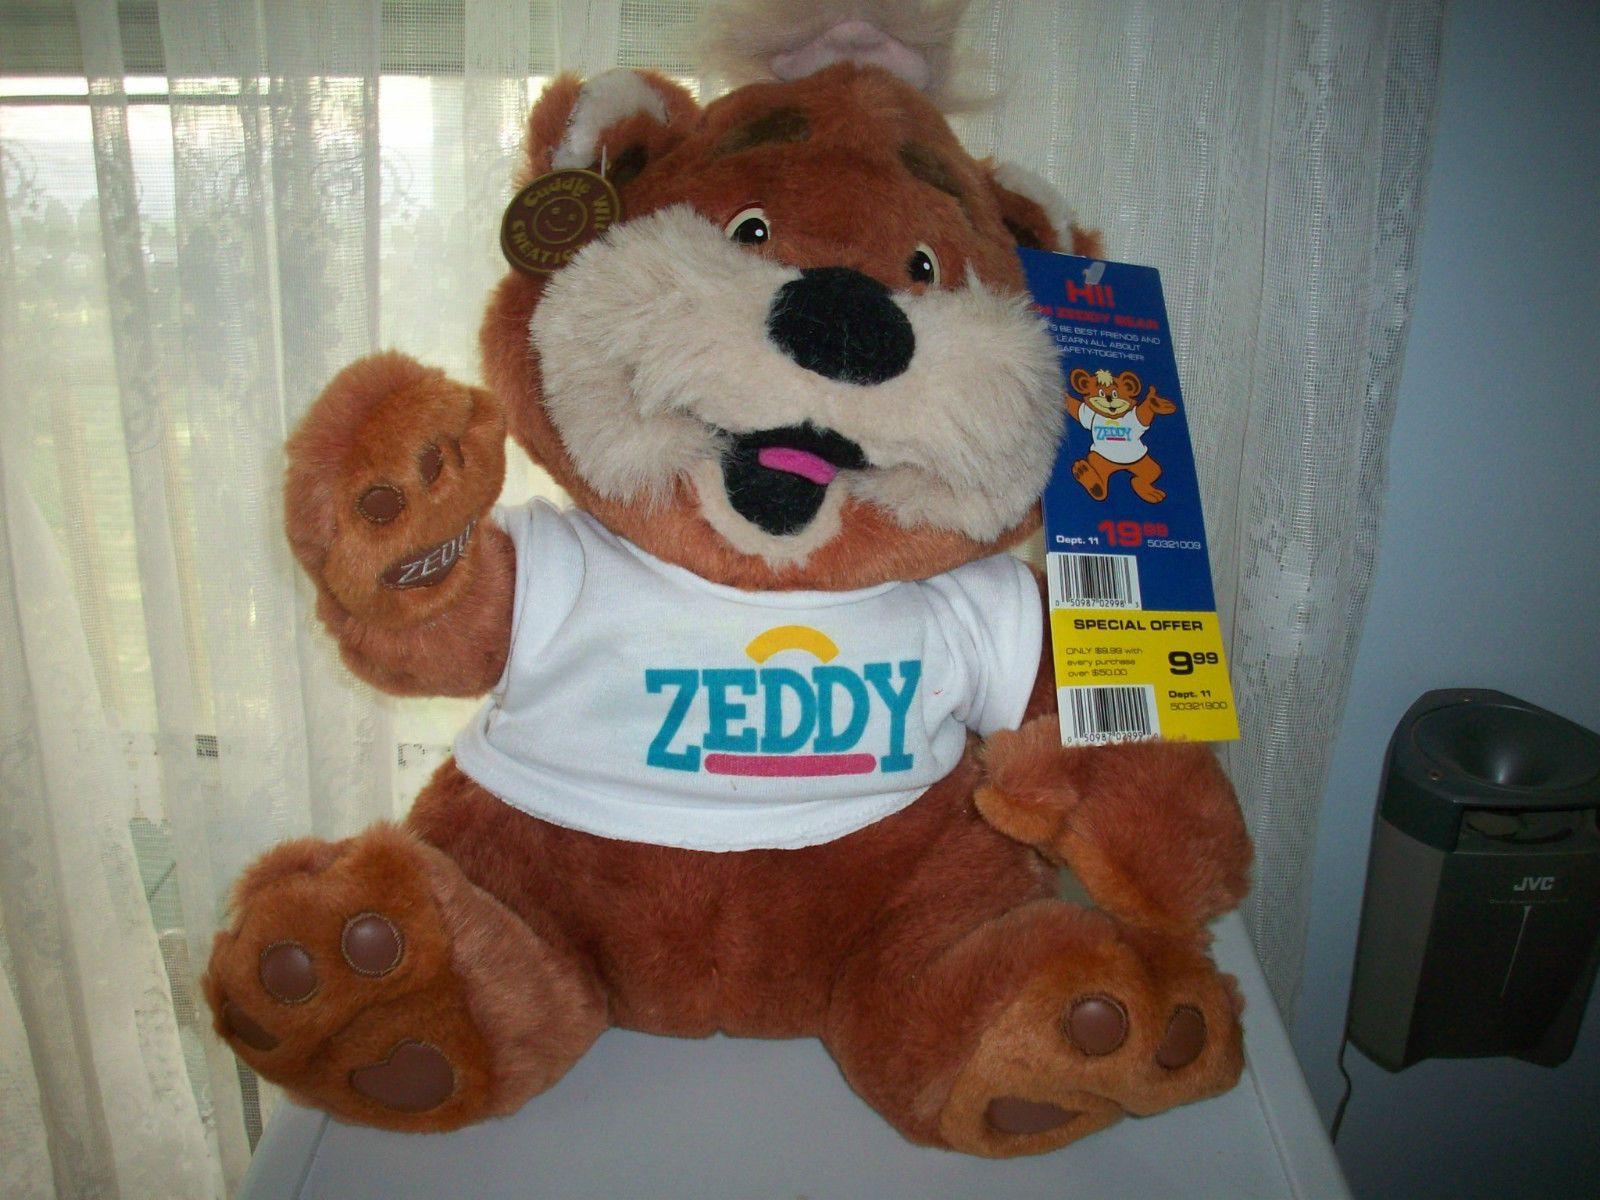 ZEDDY TEDDY BEAR ZELLERS - ALL TAGS - WOW Displayed Only | eBay | Teddy  bear, All tags, Wow!